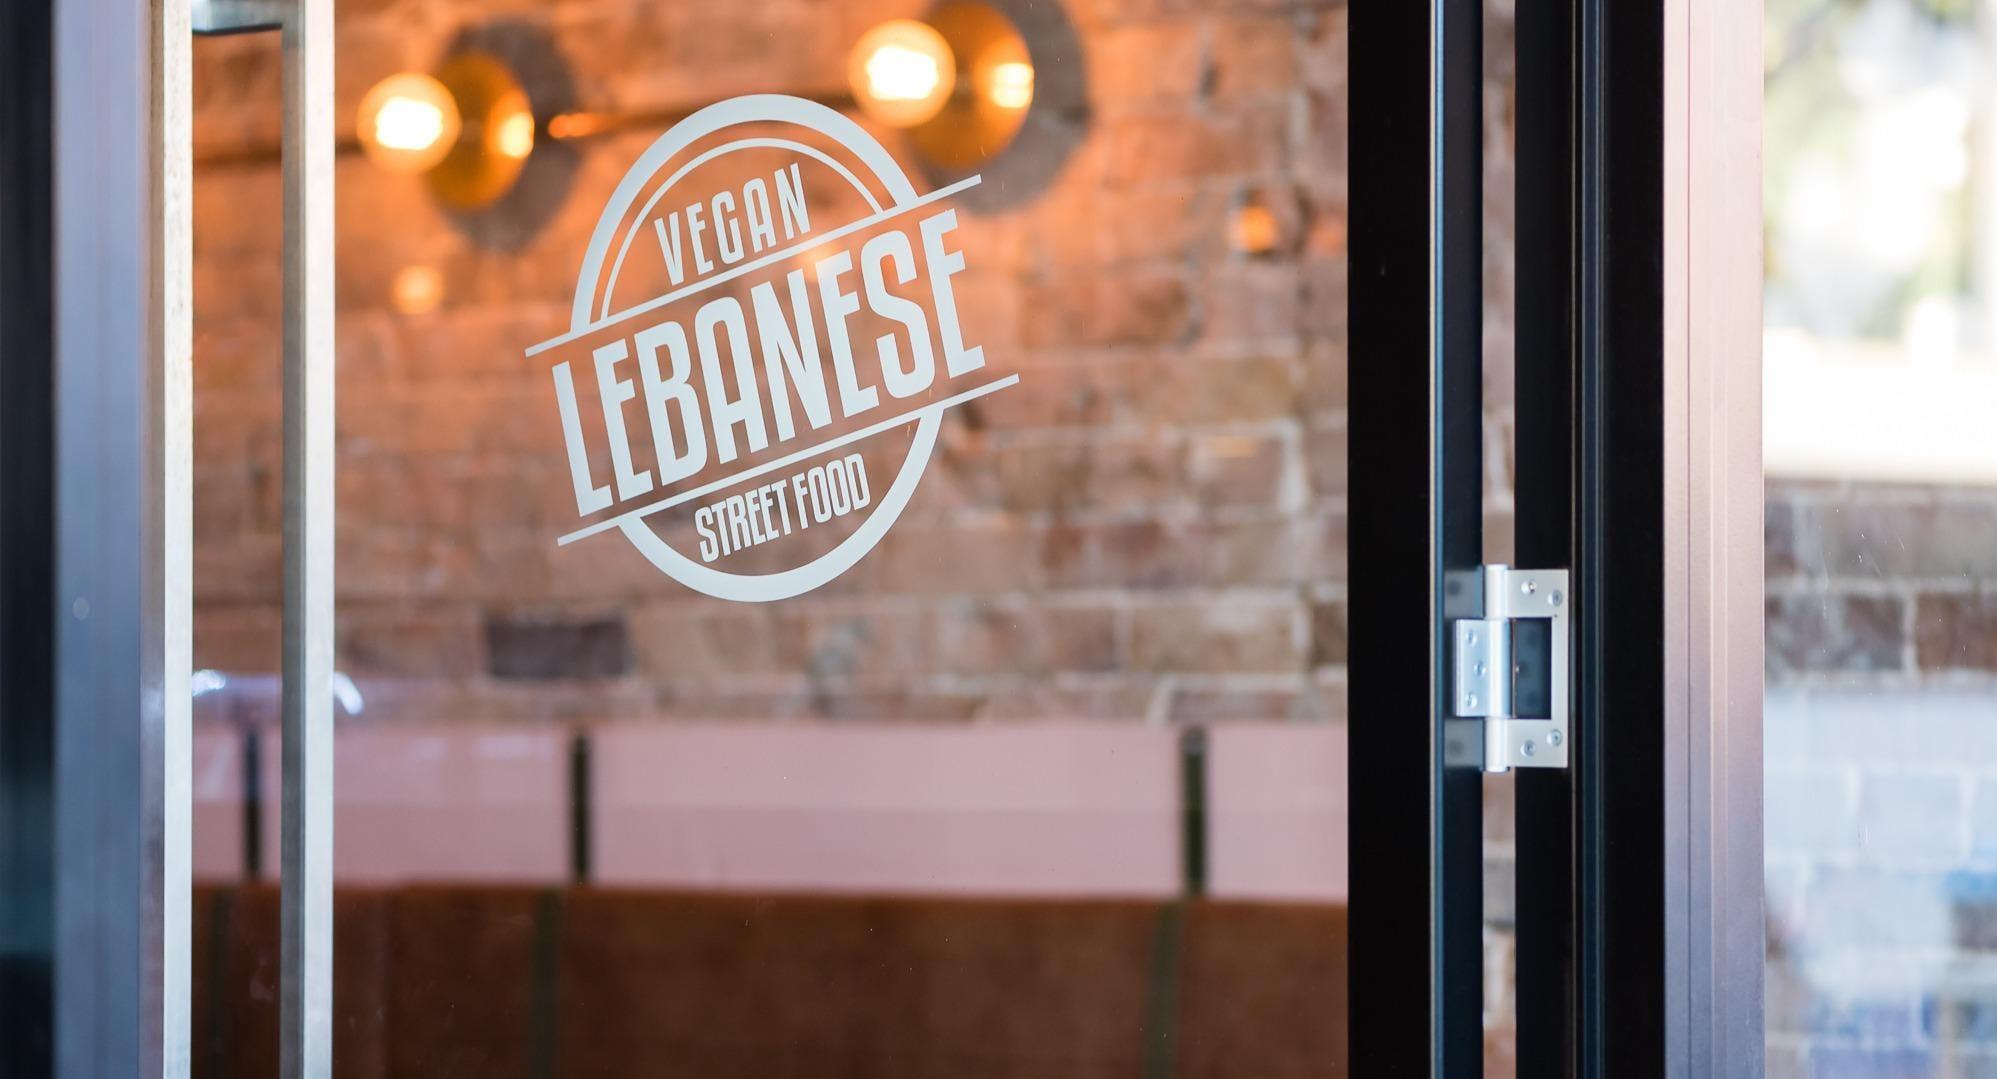 Vegan Lebanese Street Food Sydney image 2